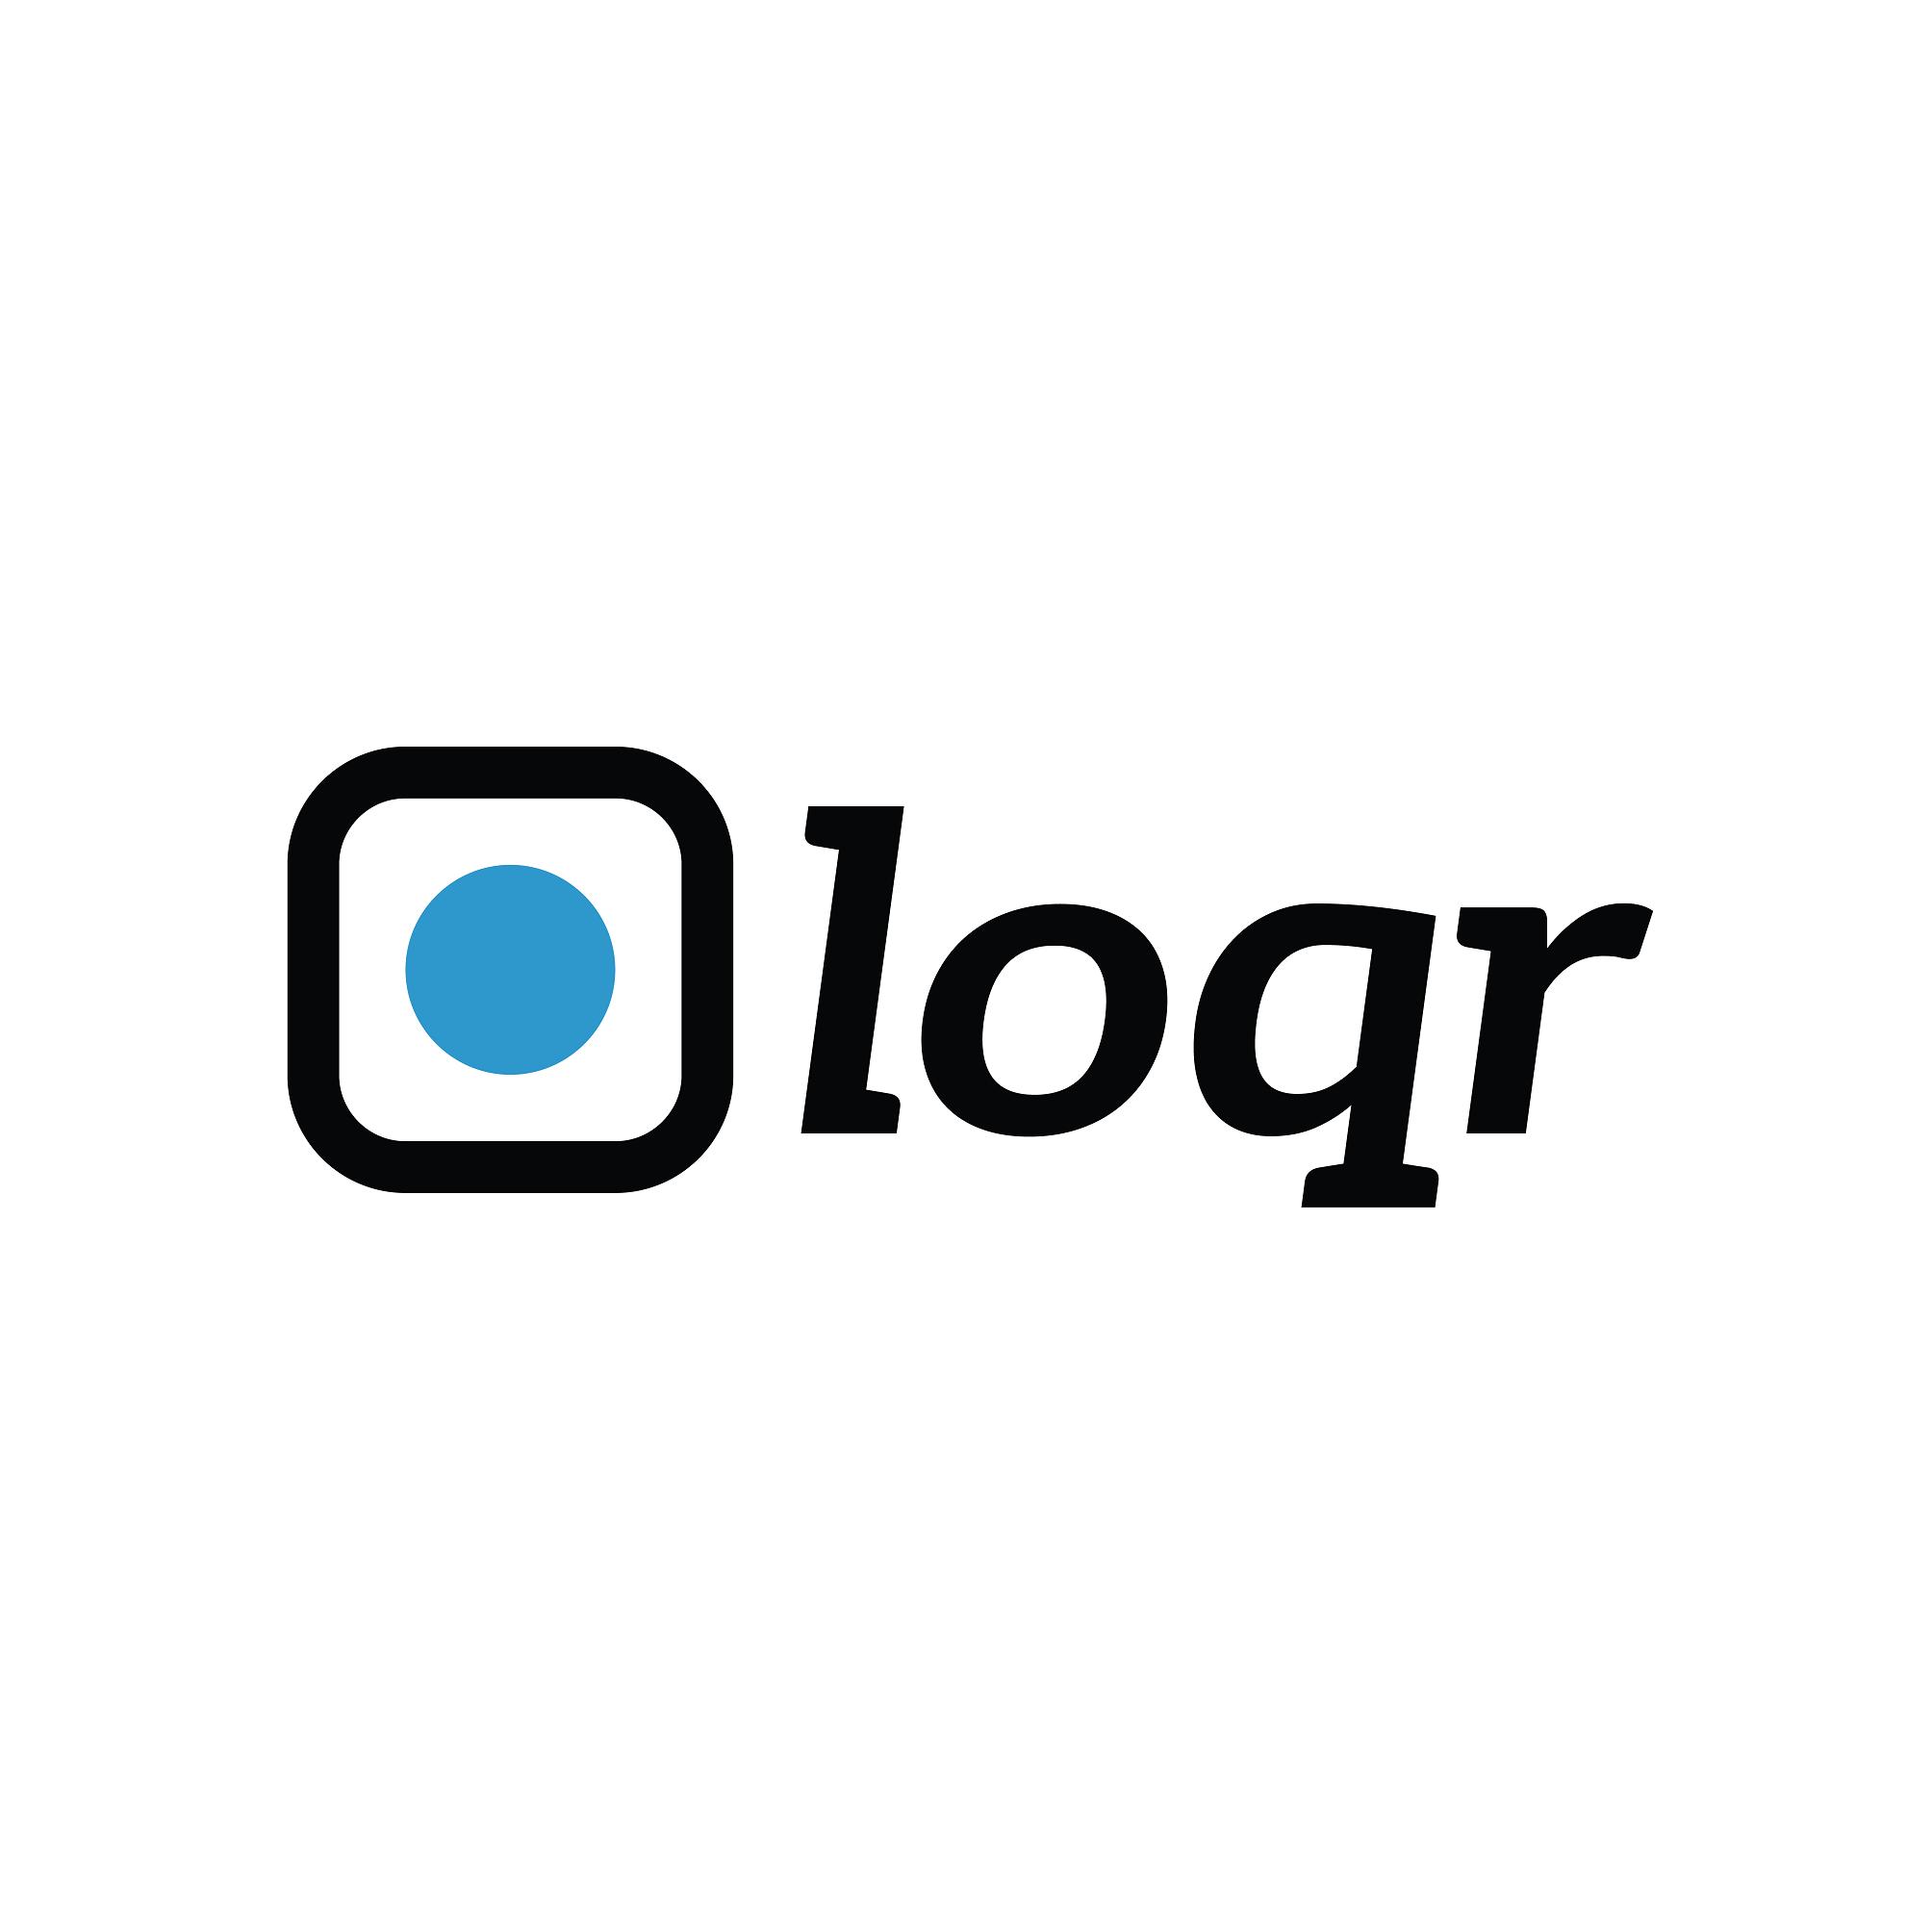 Loqr Logo Sq.png